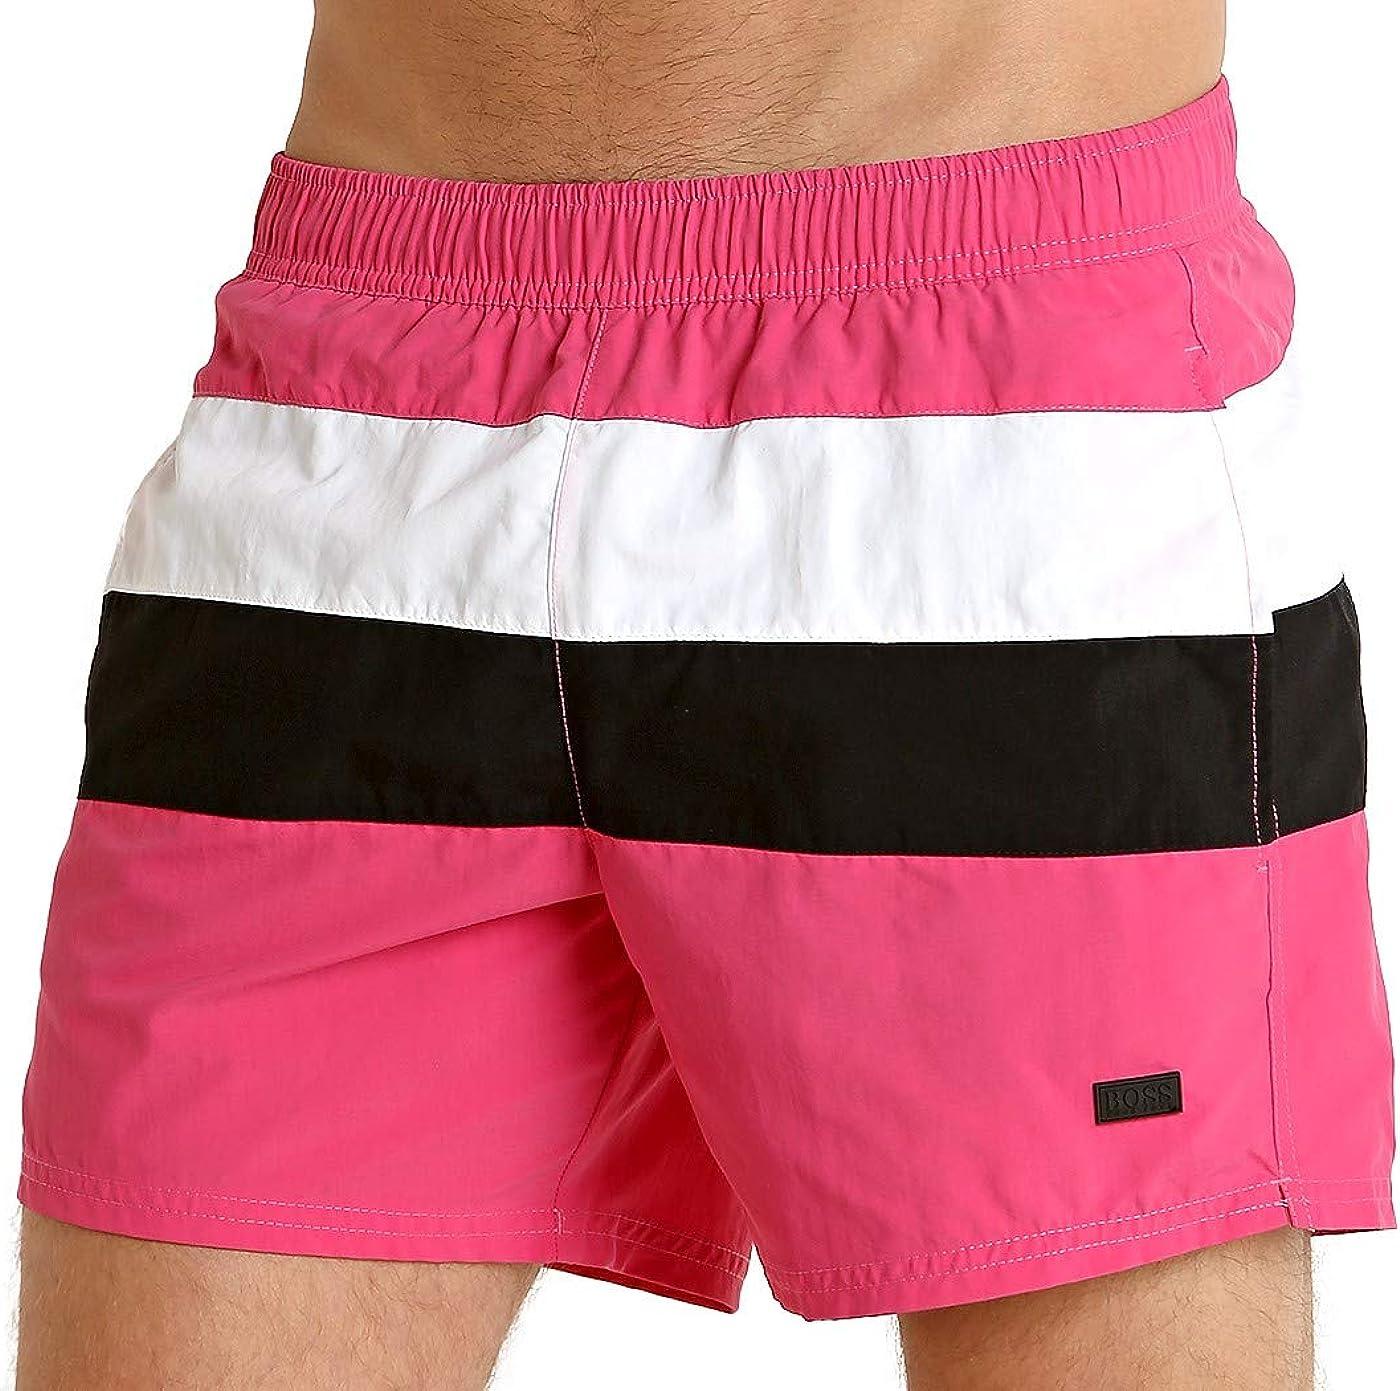 Hugo Boss Men's Wholesale Pattern Length Short Swim free shipping Trunk